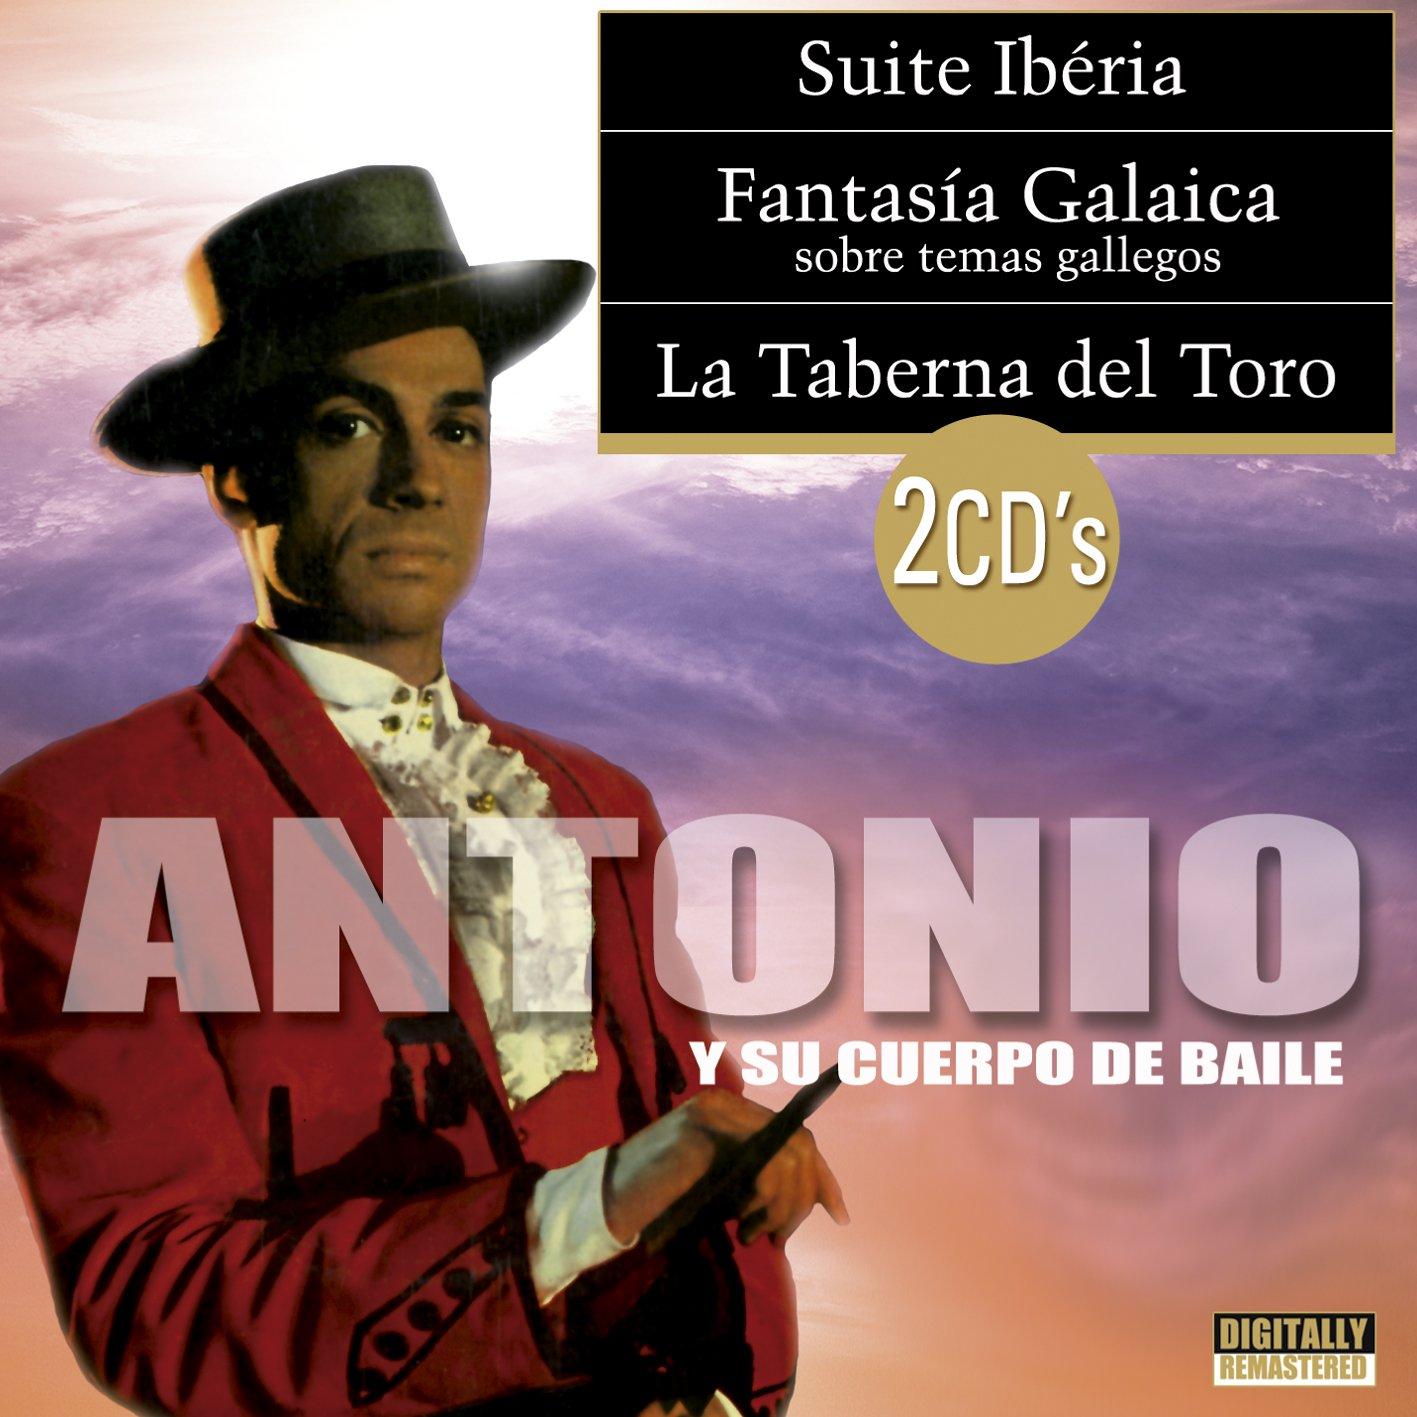 Suite Iberia / Fantasia Galaica / La TAberna del Toro: Antonio u su ...